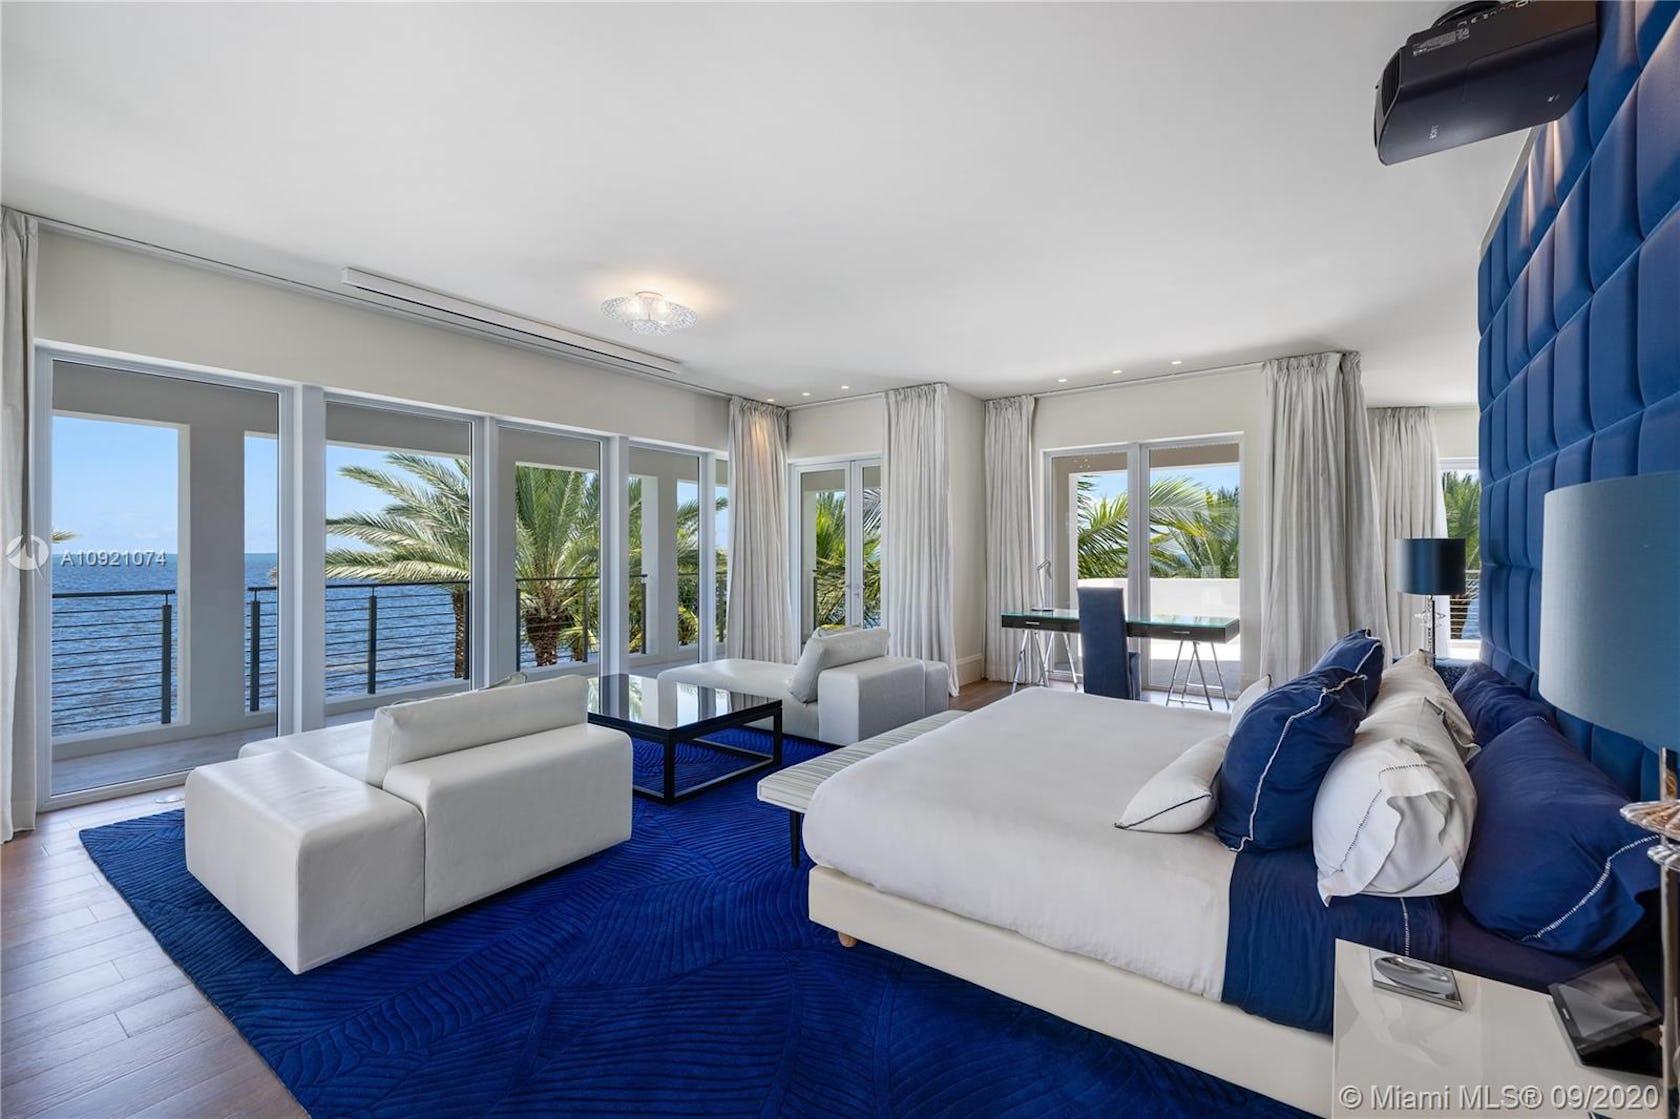 interior design indoors room furniture bedroom living room flooring housing rug